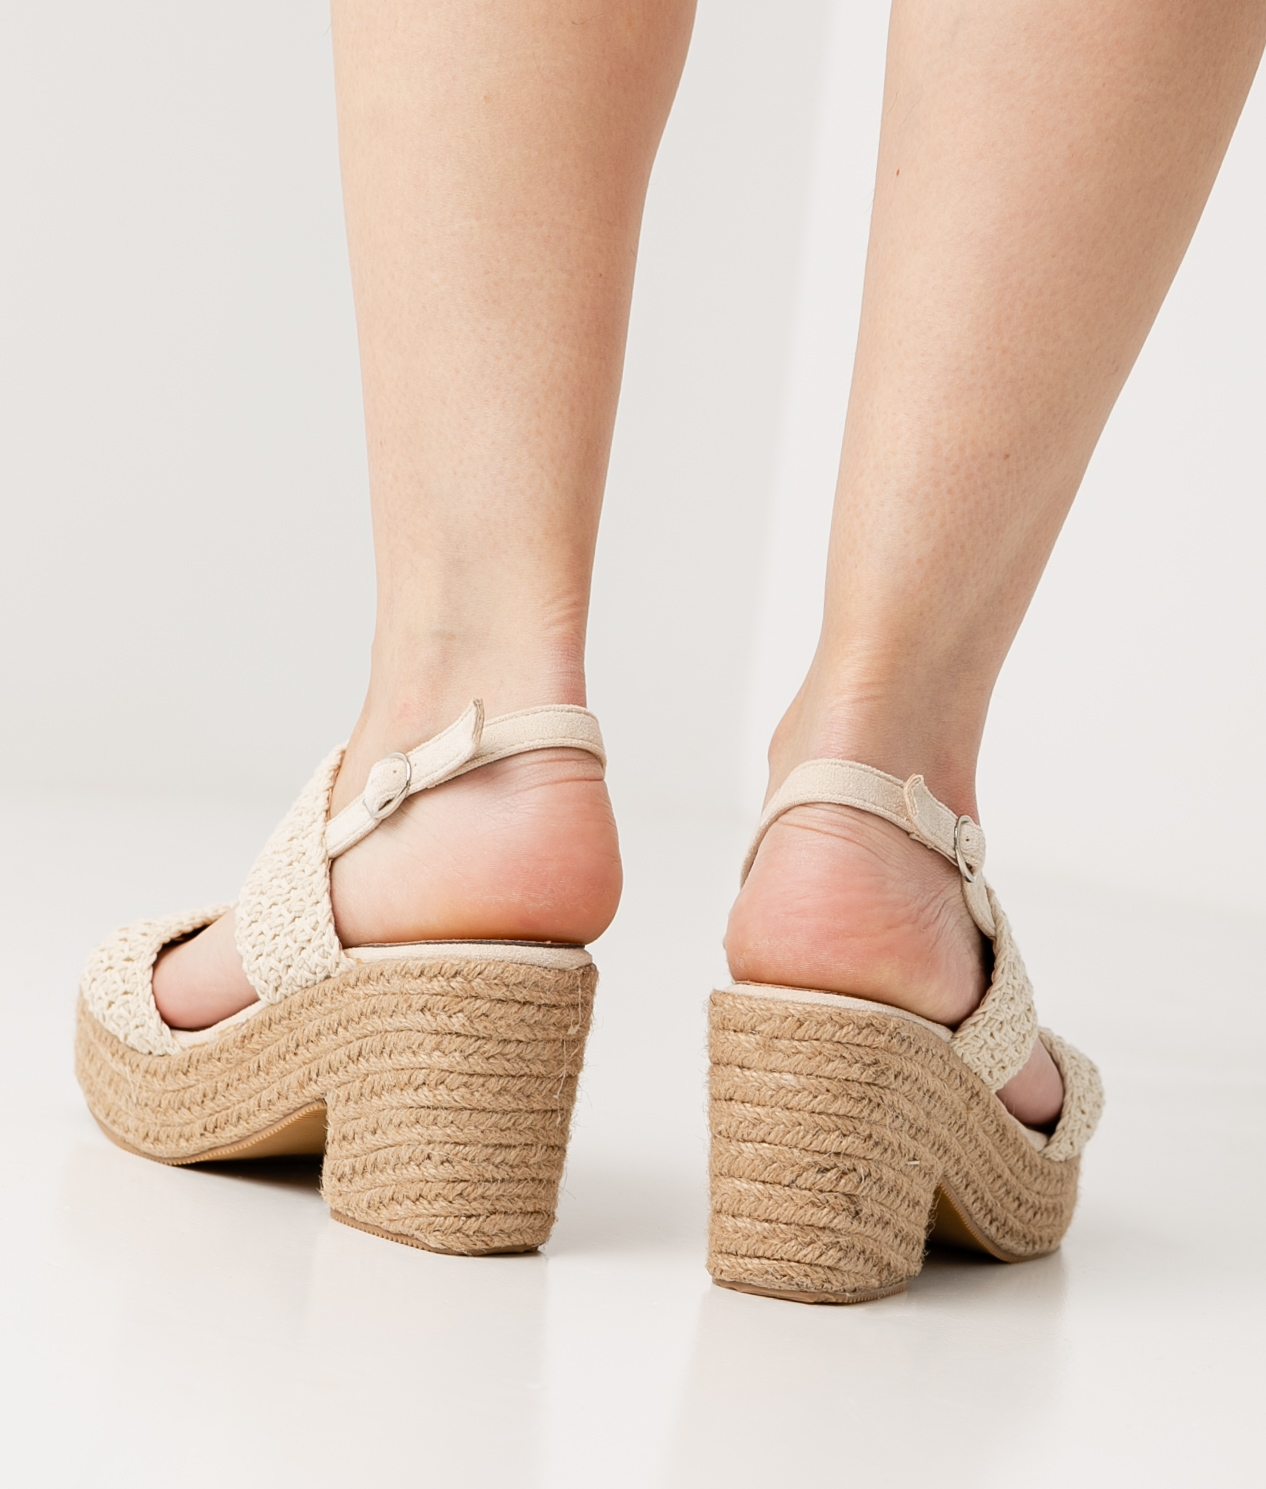 Sandalo Alto Blemy - Beige